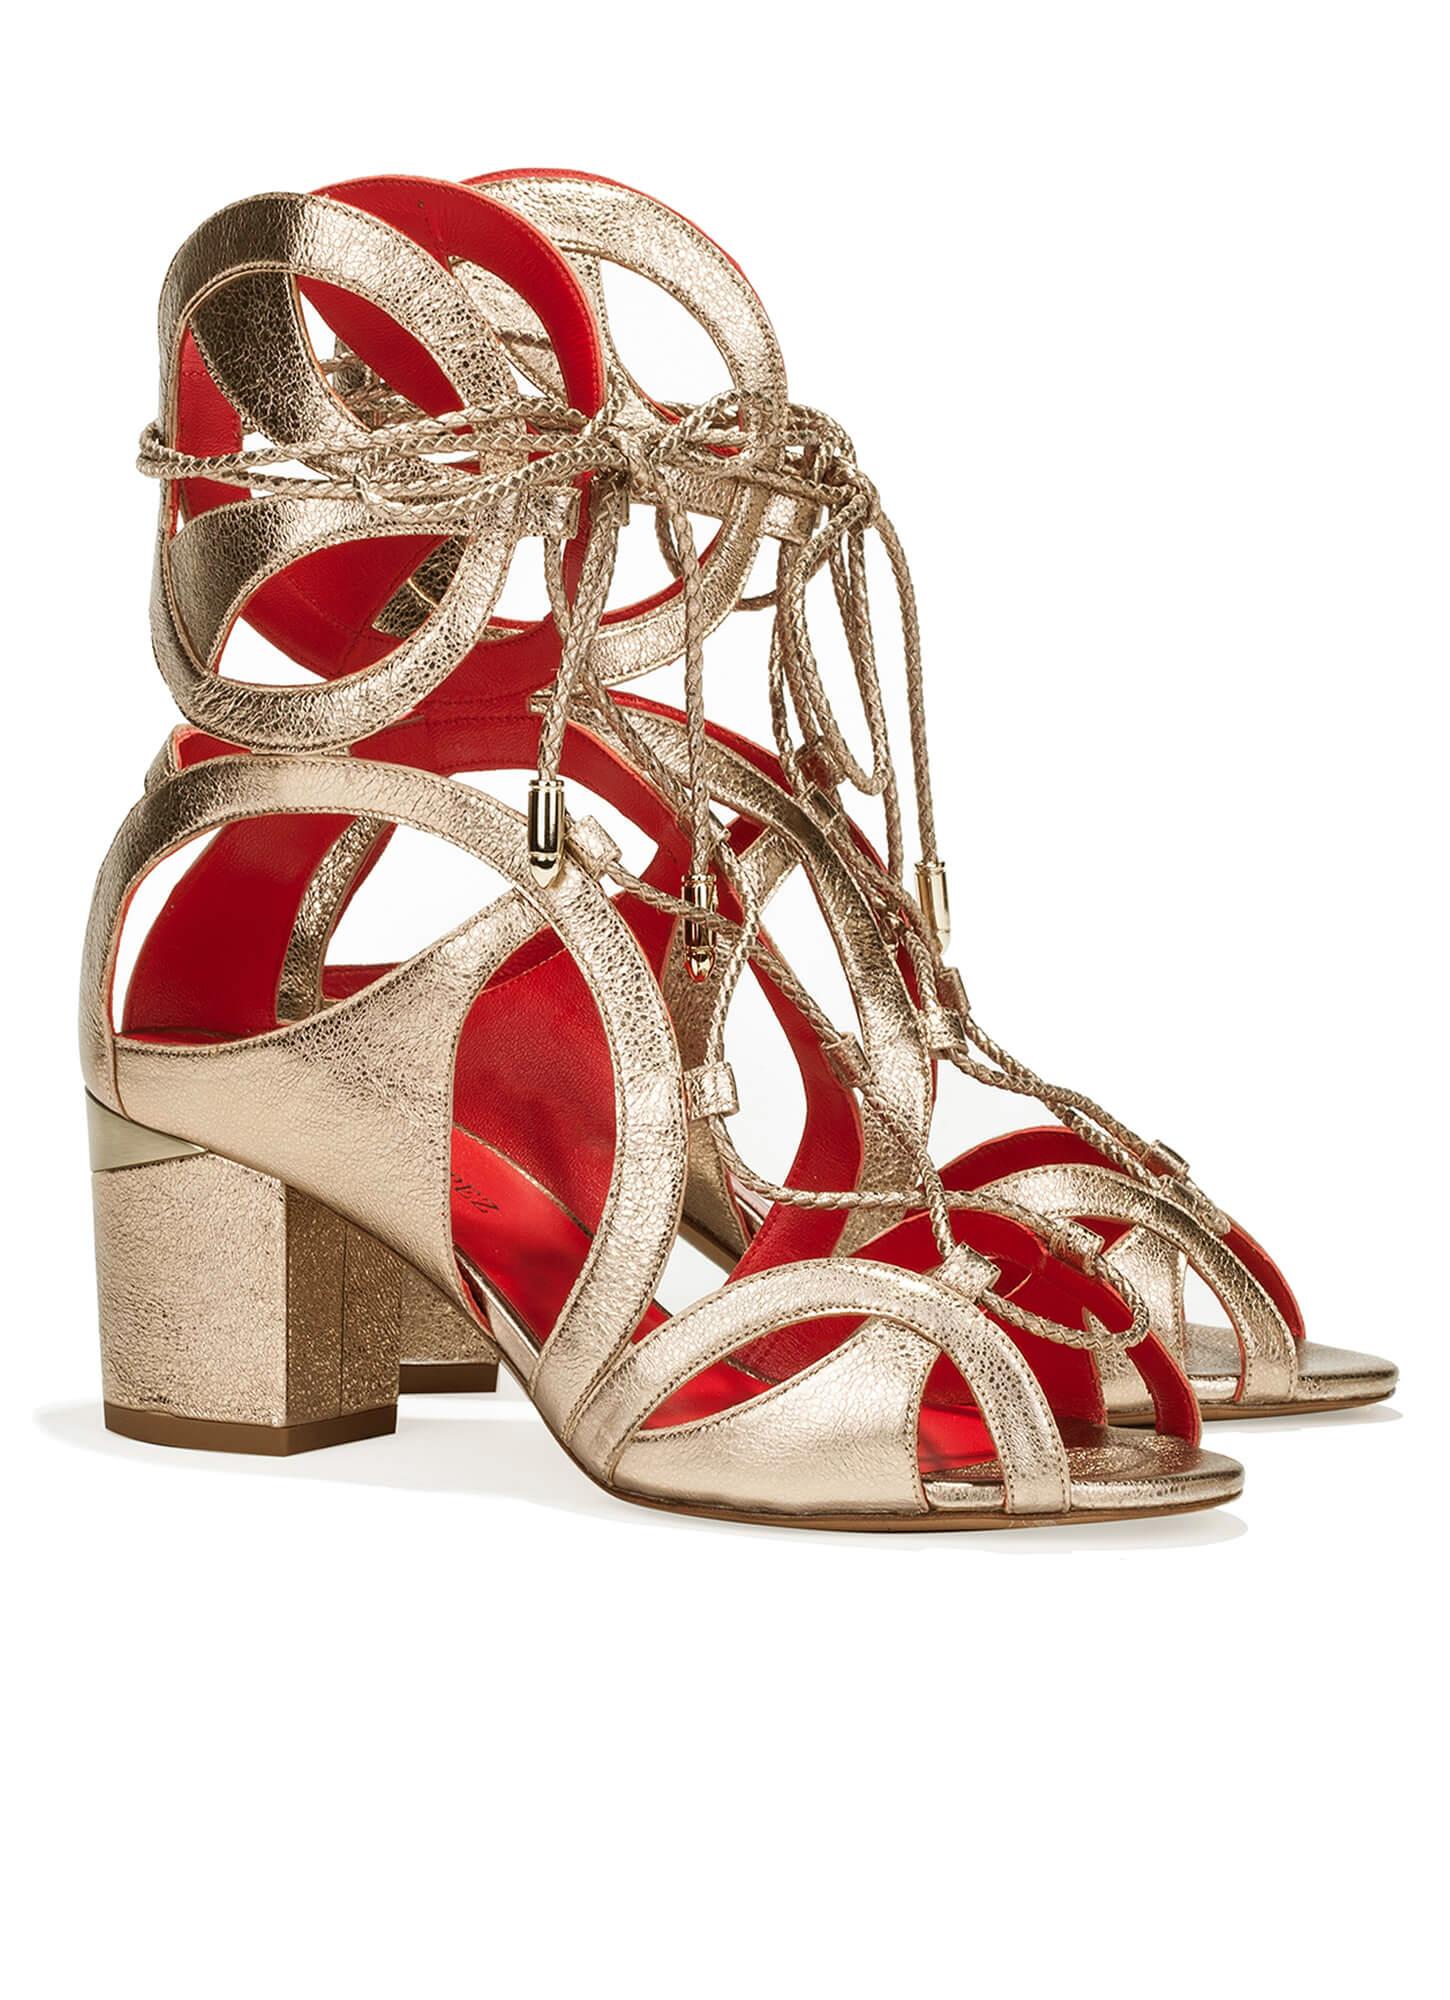 321b16c5f0fb Lace-up mid block heel sandals in champagne metallic leather Cutout sandals  in metallic leather - shoe store Pura López Keoma Pura López ...